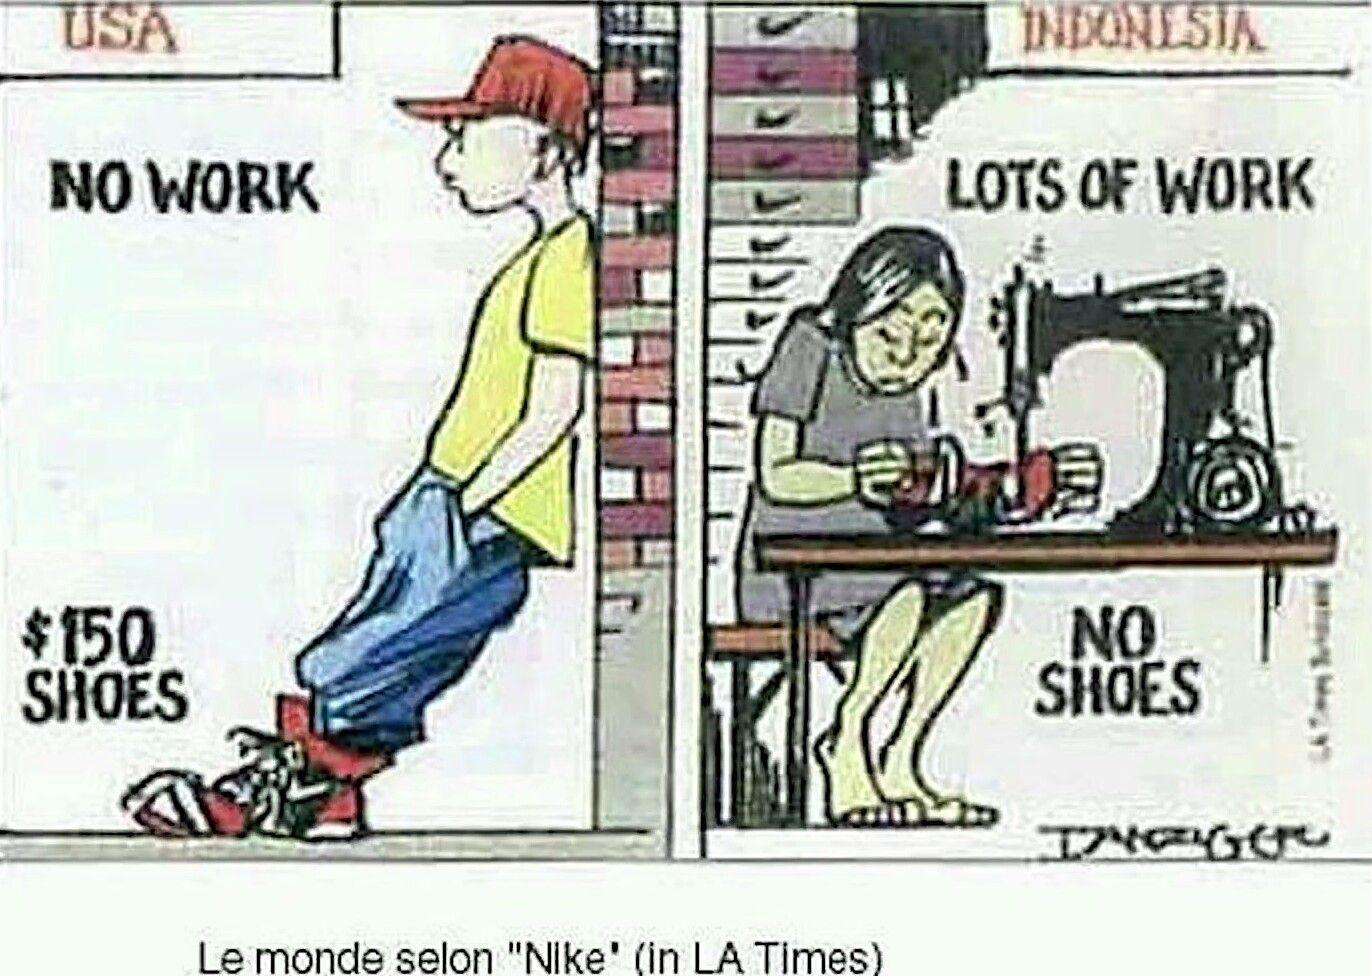 Pin By Keila Mayli Guaman On Okoc Funny Cartoon Memes Satirical Illustrations Funny Illustration